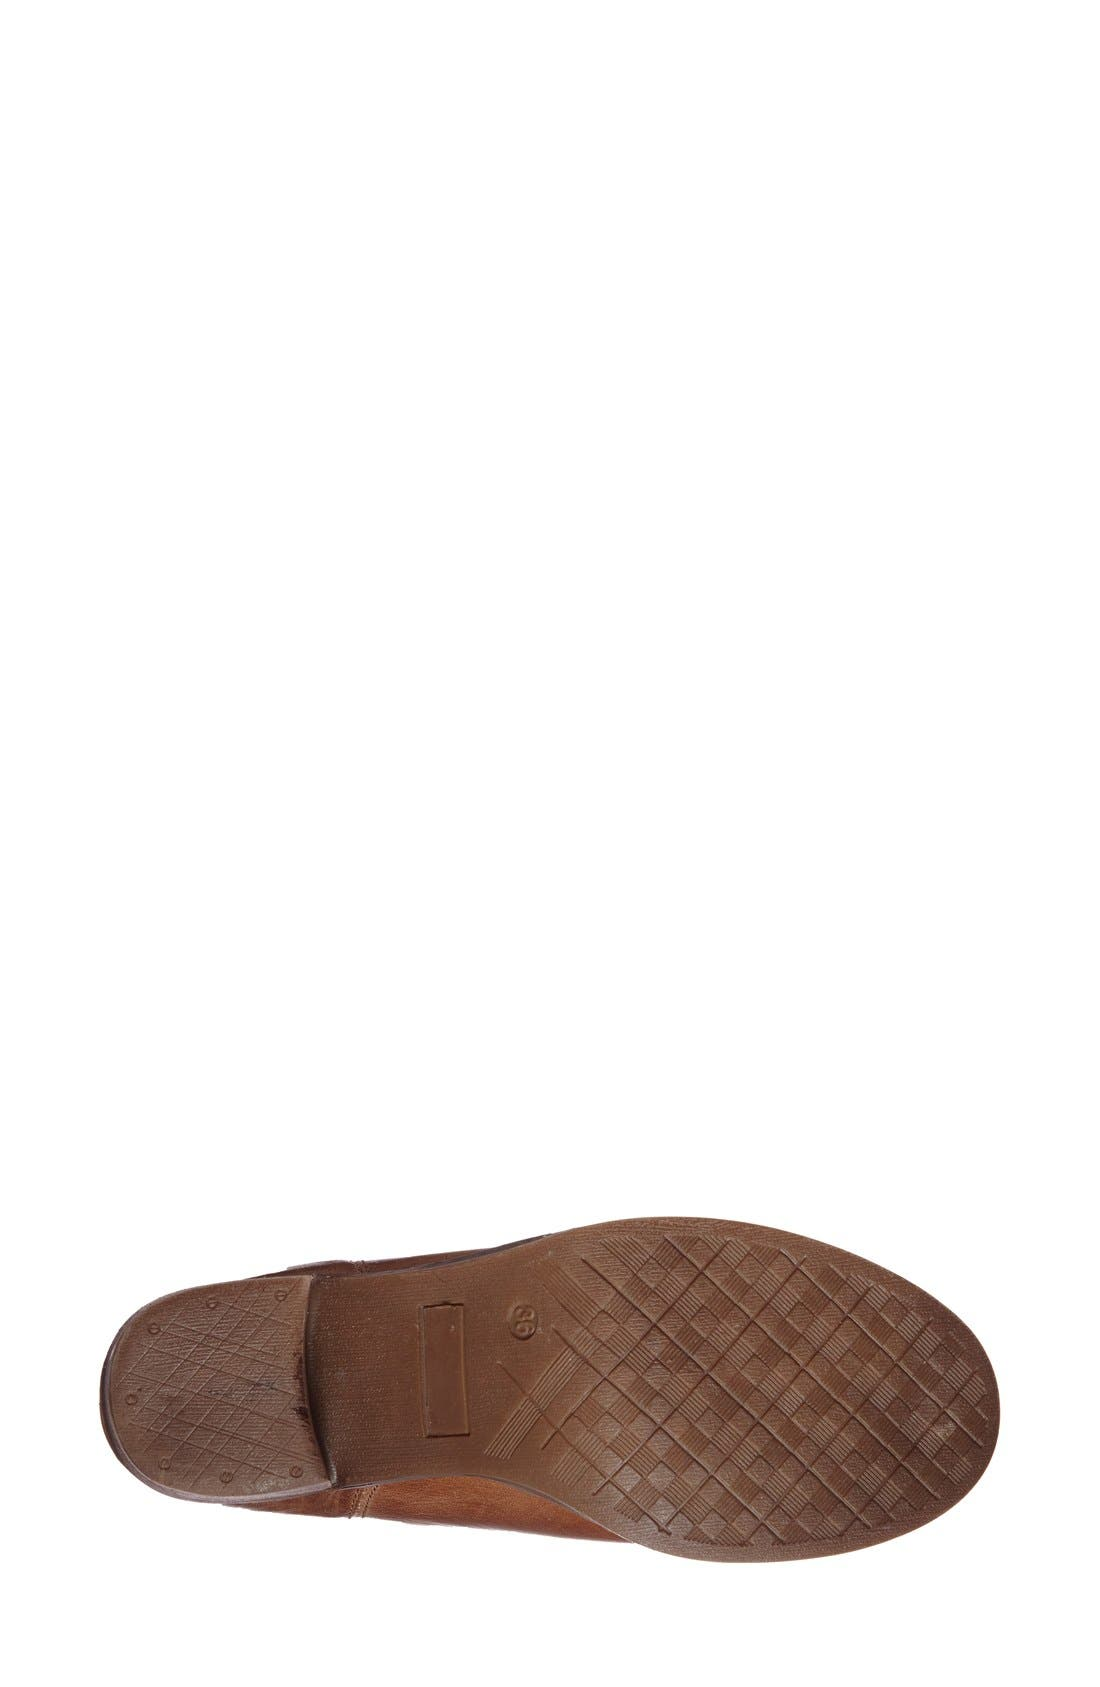 Alternate Image 4  - MTNG Originals 'Bree' Leather Platform Bootie (Women)